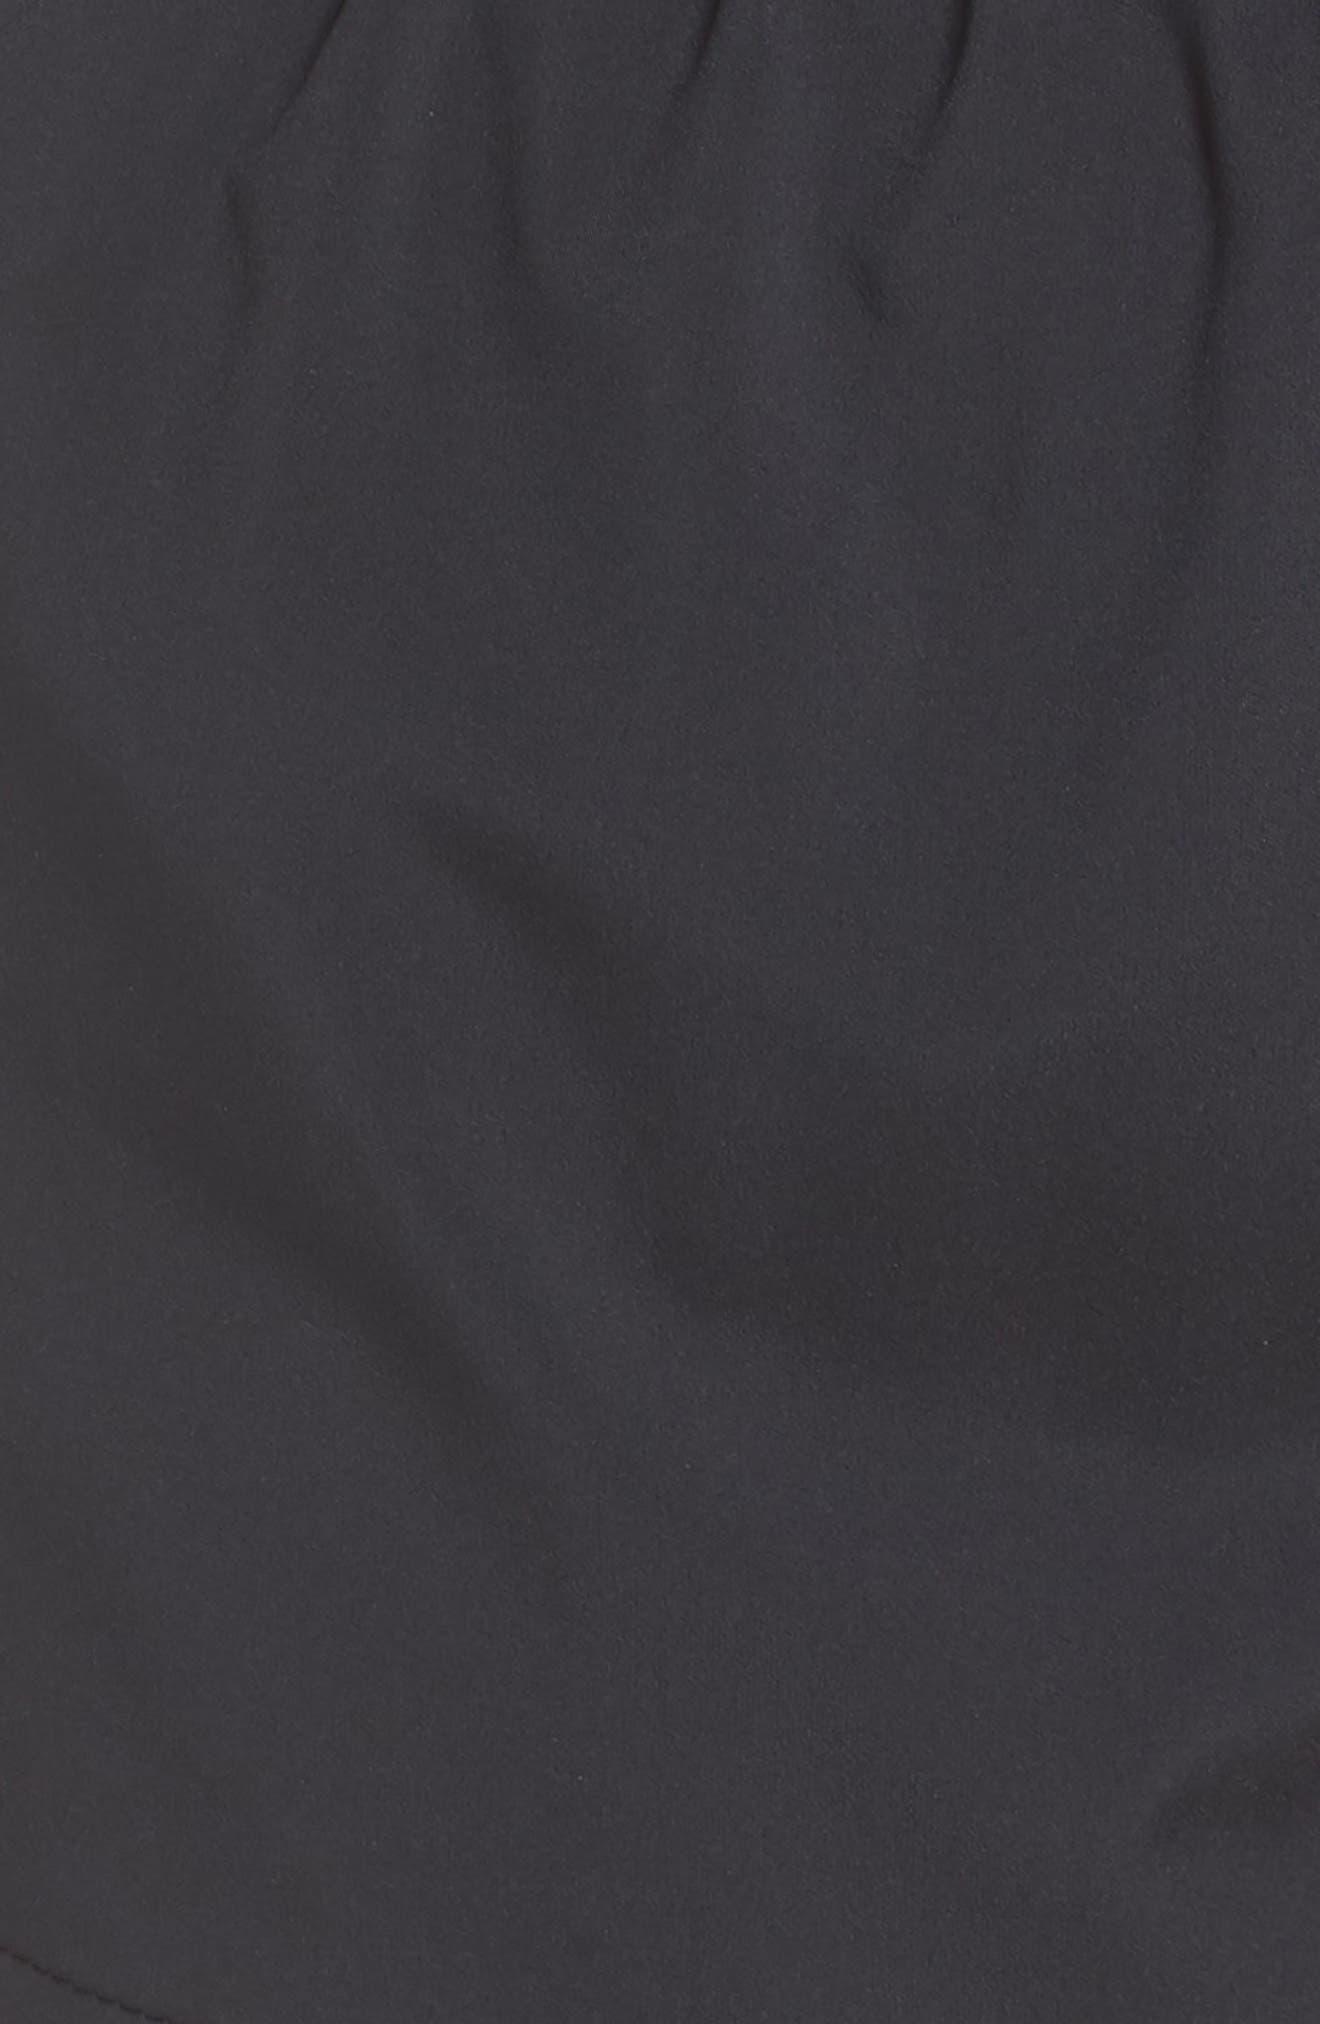 Flex Running Shorts,                             Alternate thumbnail 6, color,                             Black/ Gunsmoke